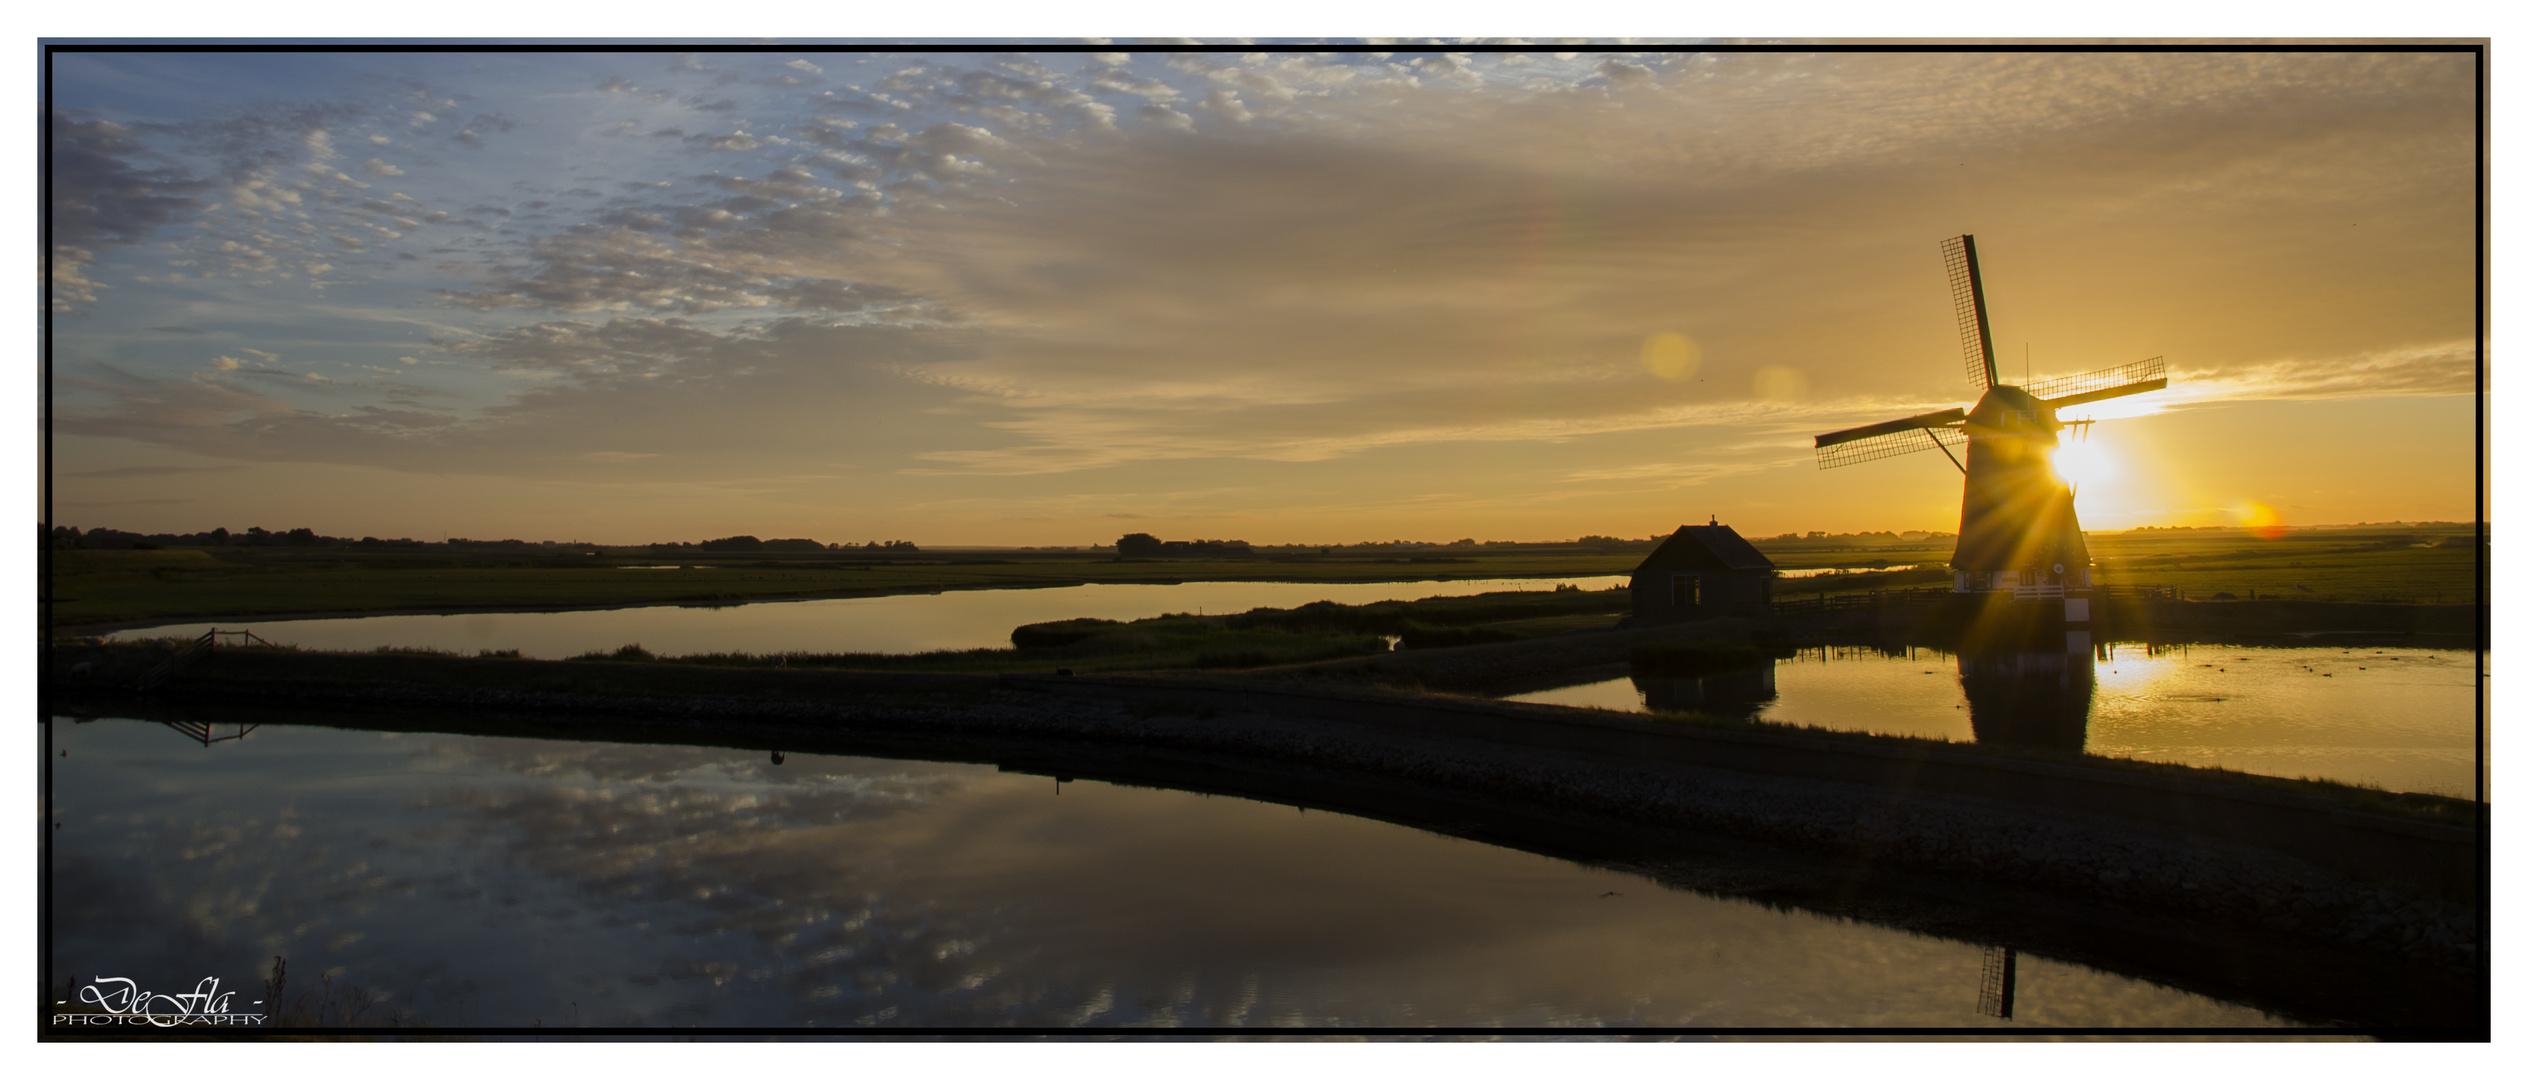 Texel-Mühle